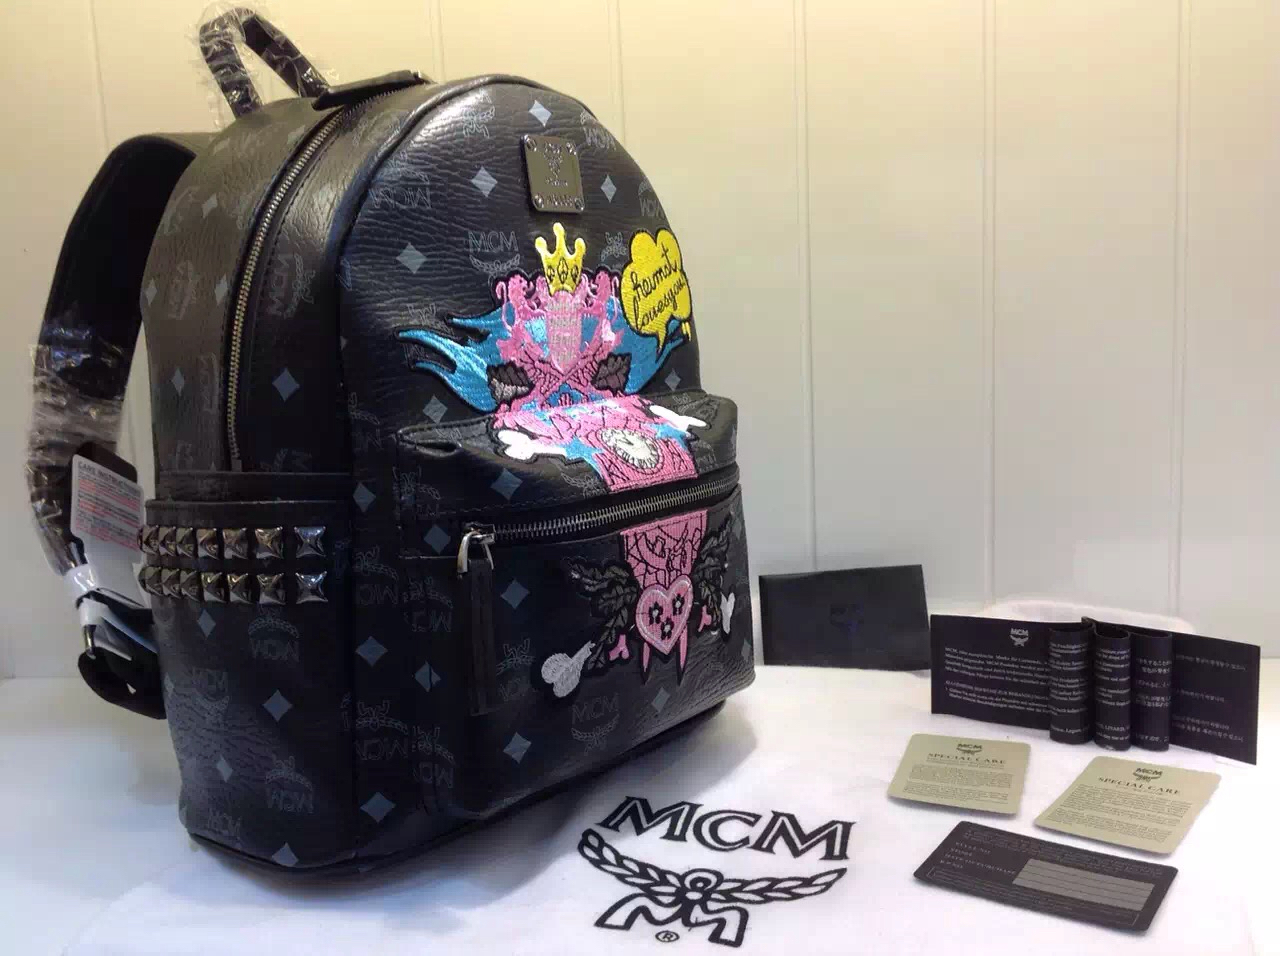 MCM 40years限量珍藏纪念版 Stefan Strumbel系列 精美刺绣个性涂鸦 黑色